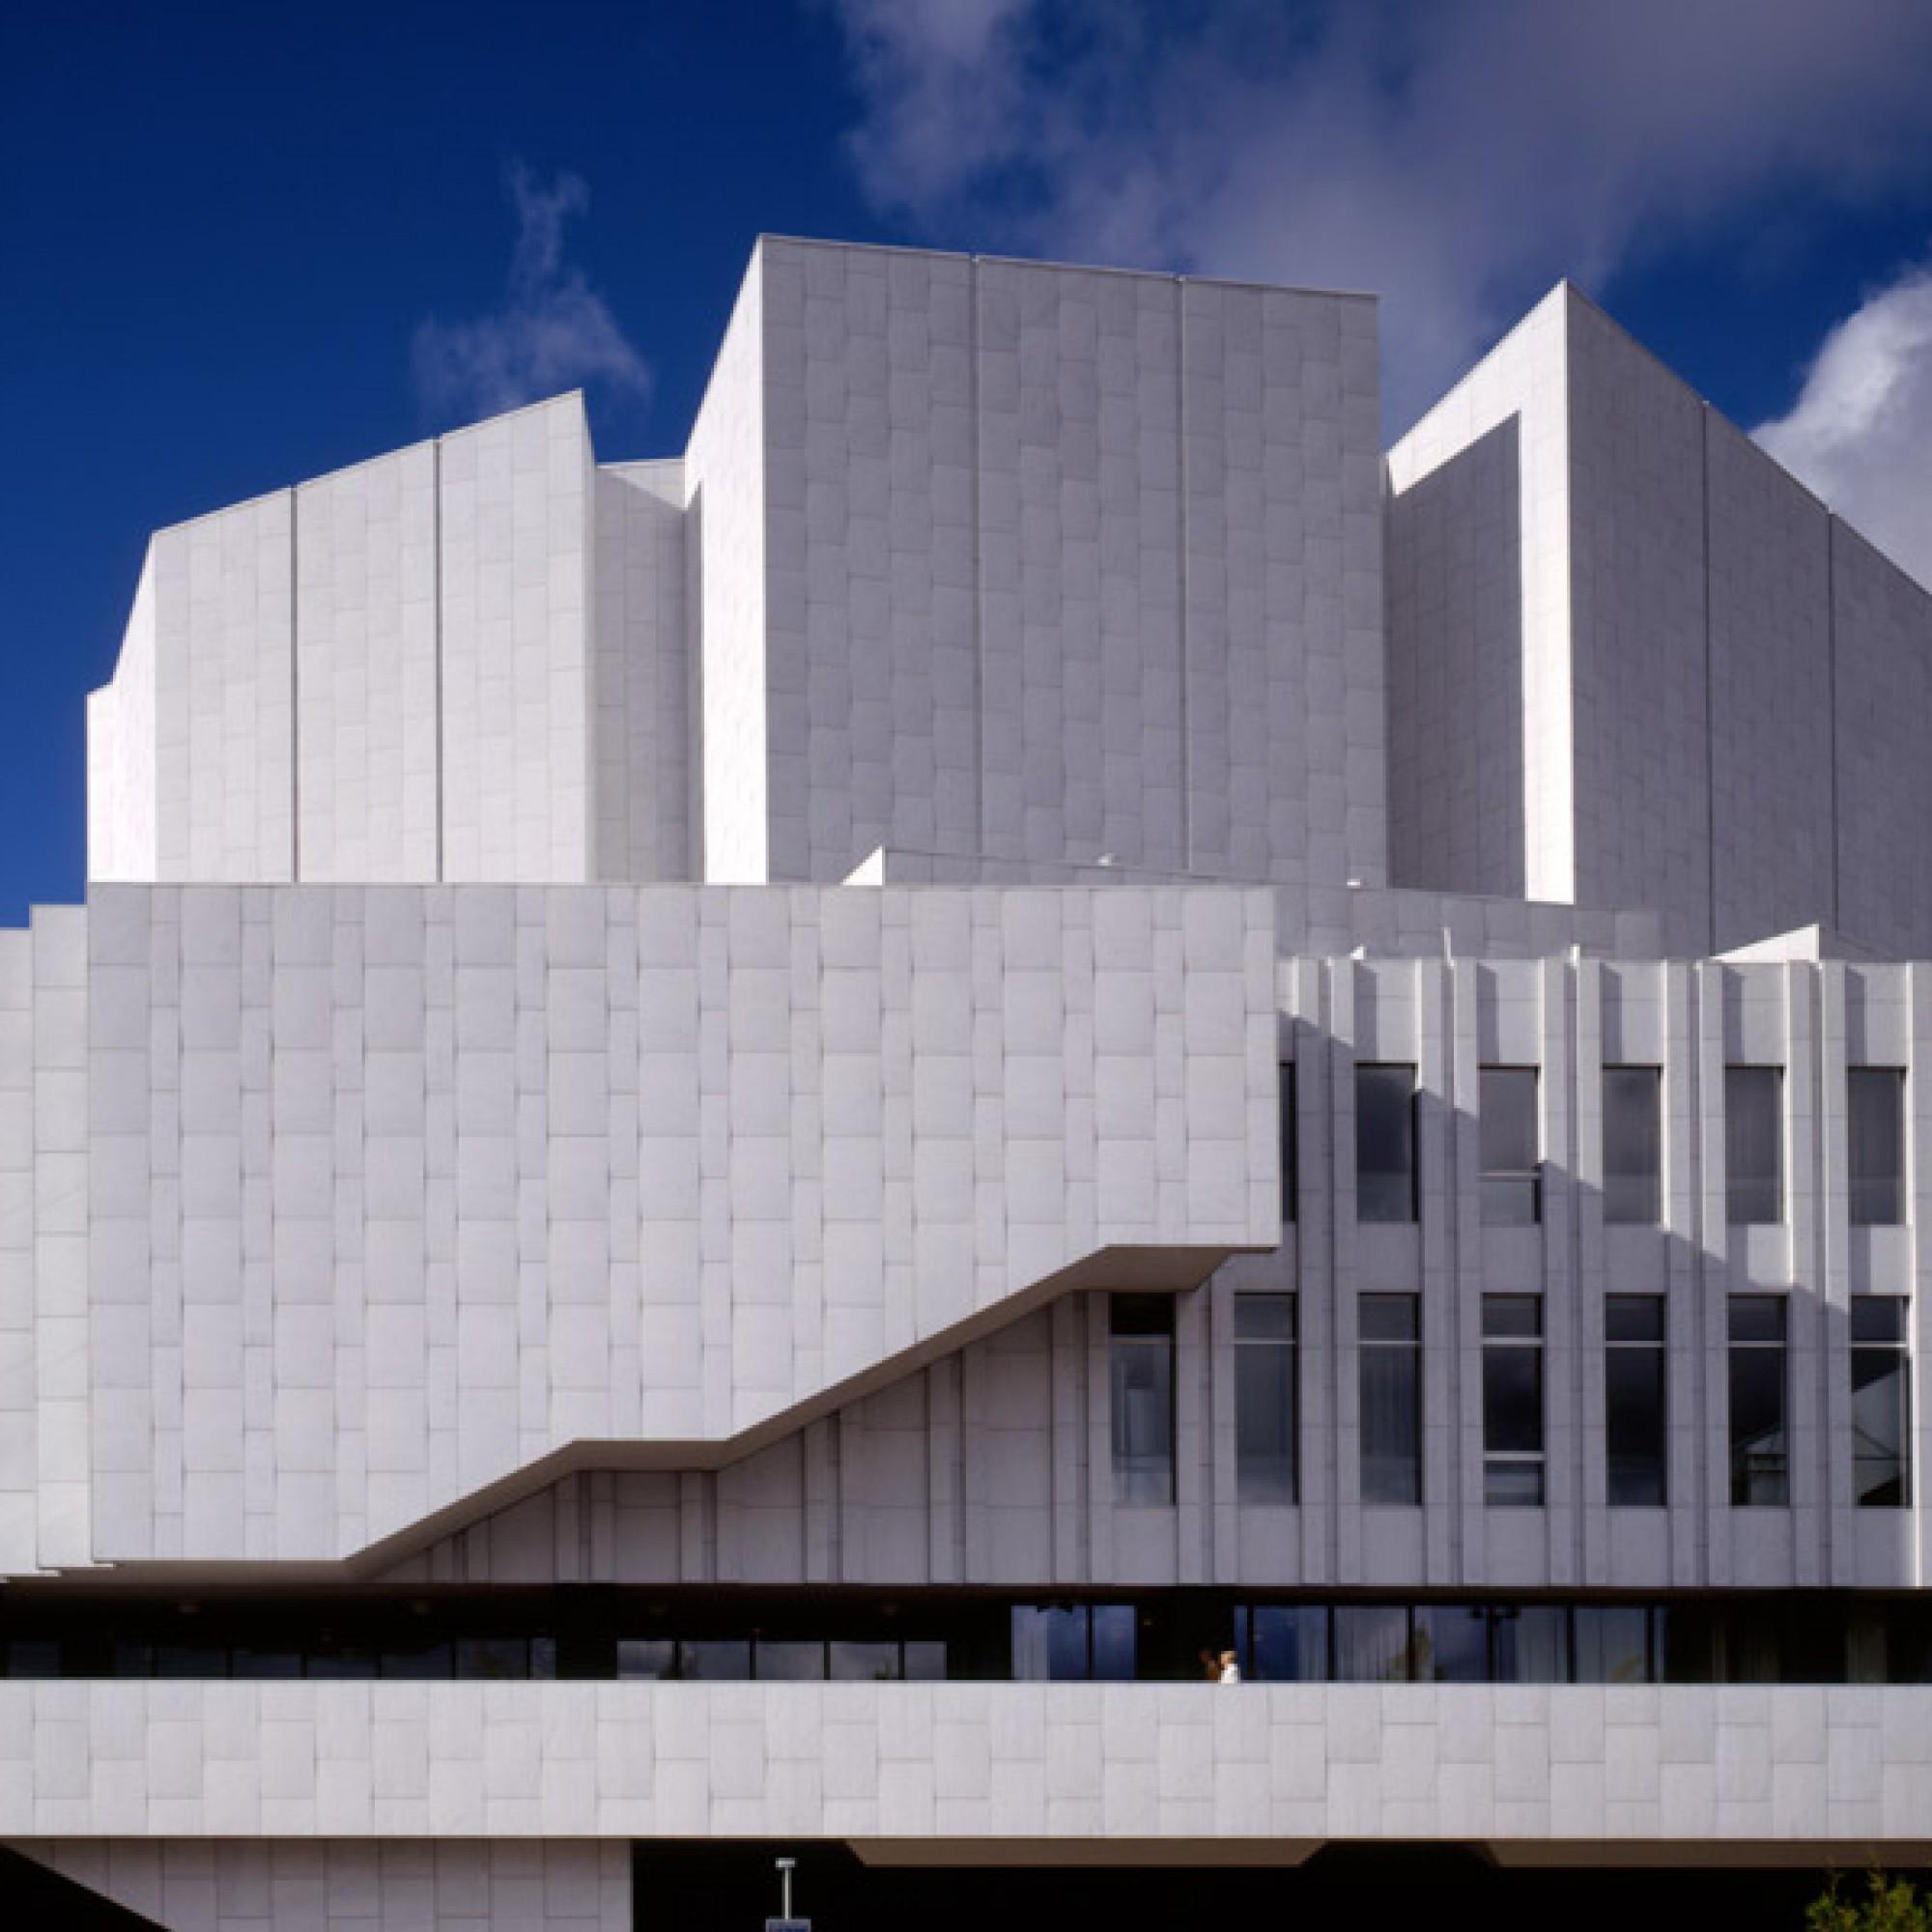 Konzert- und Kongresshaus Finlandia, Helsinki, 1962–197. (Alvar Aalto Museum, Foto: Rune Snellman / 2014, Pro Litteris, Zürich)